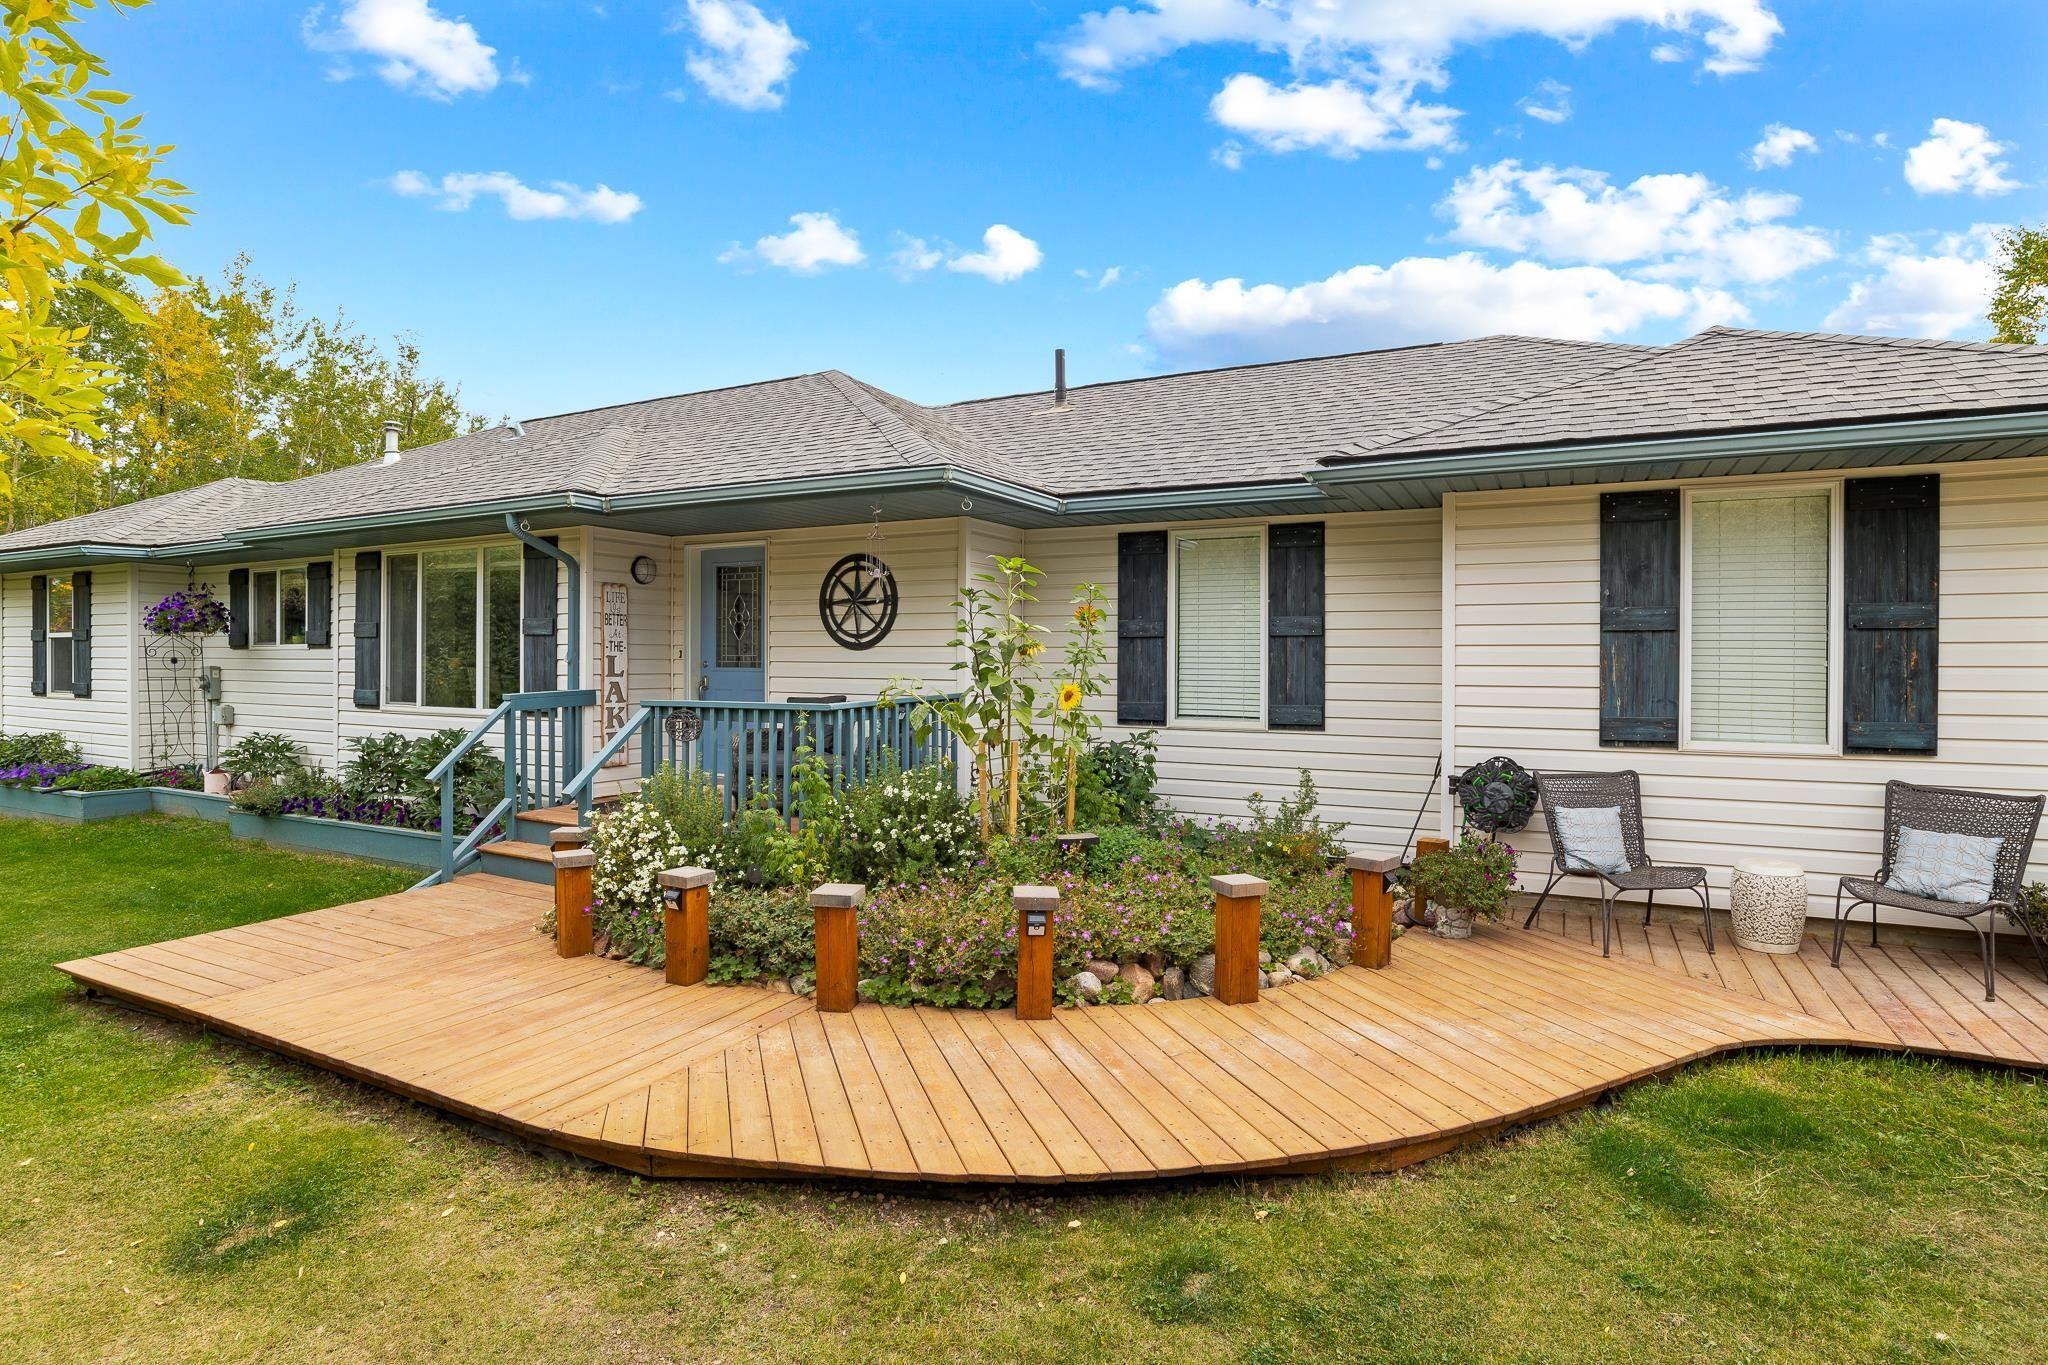 Main Photo: 2811 24 Avenue: Cold Lake House for sale : MLS®# E4263101